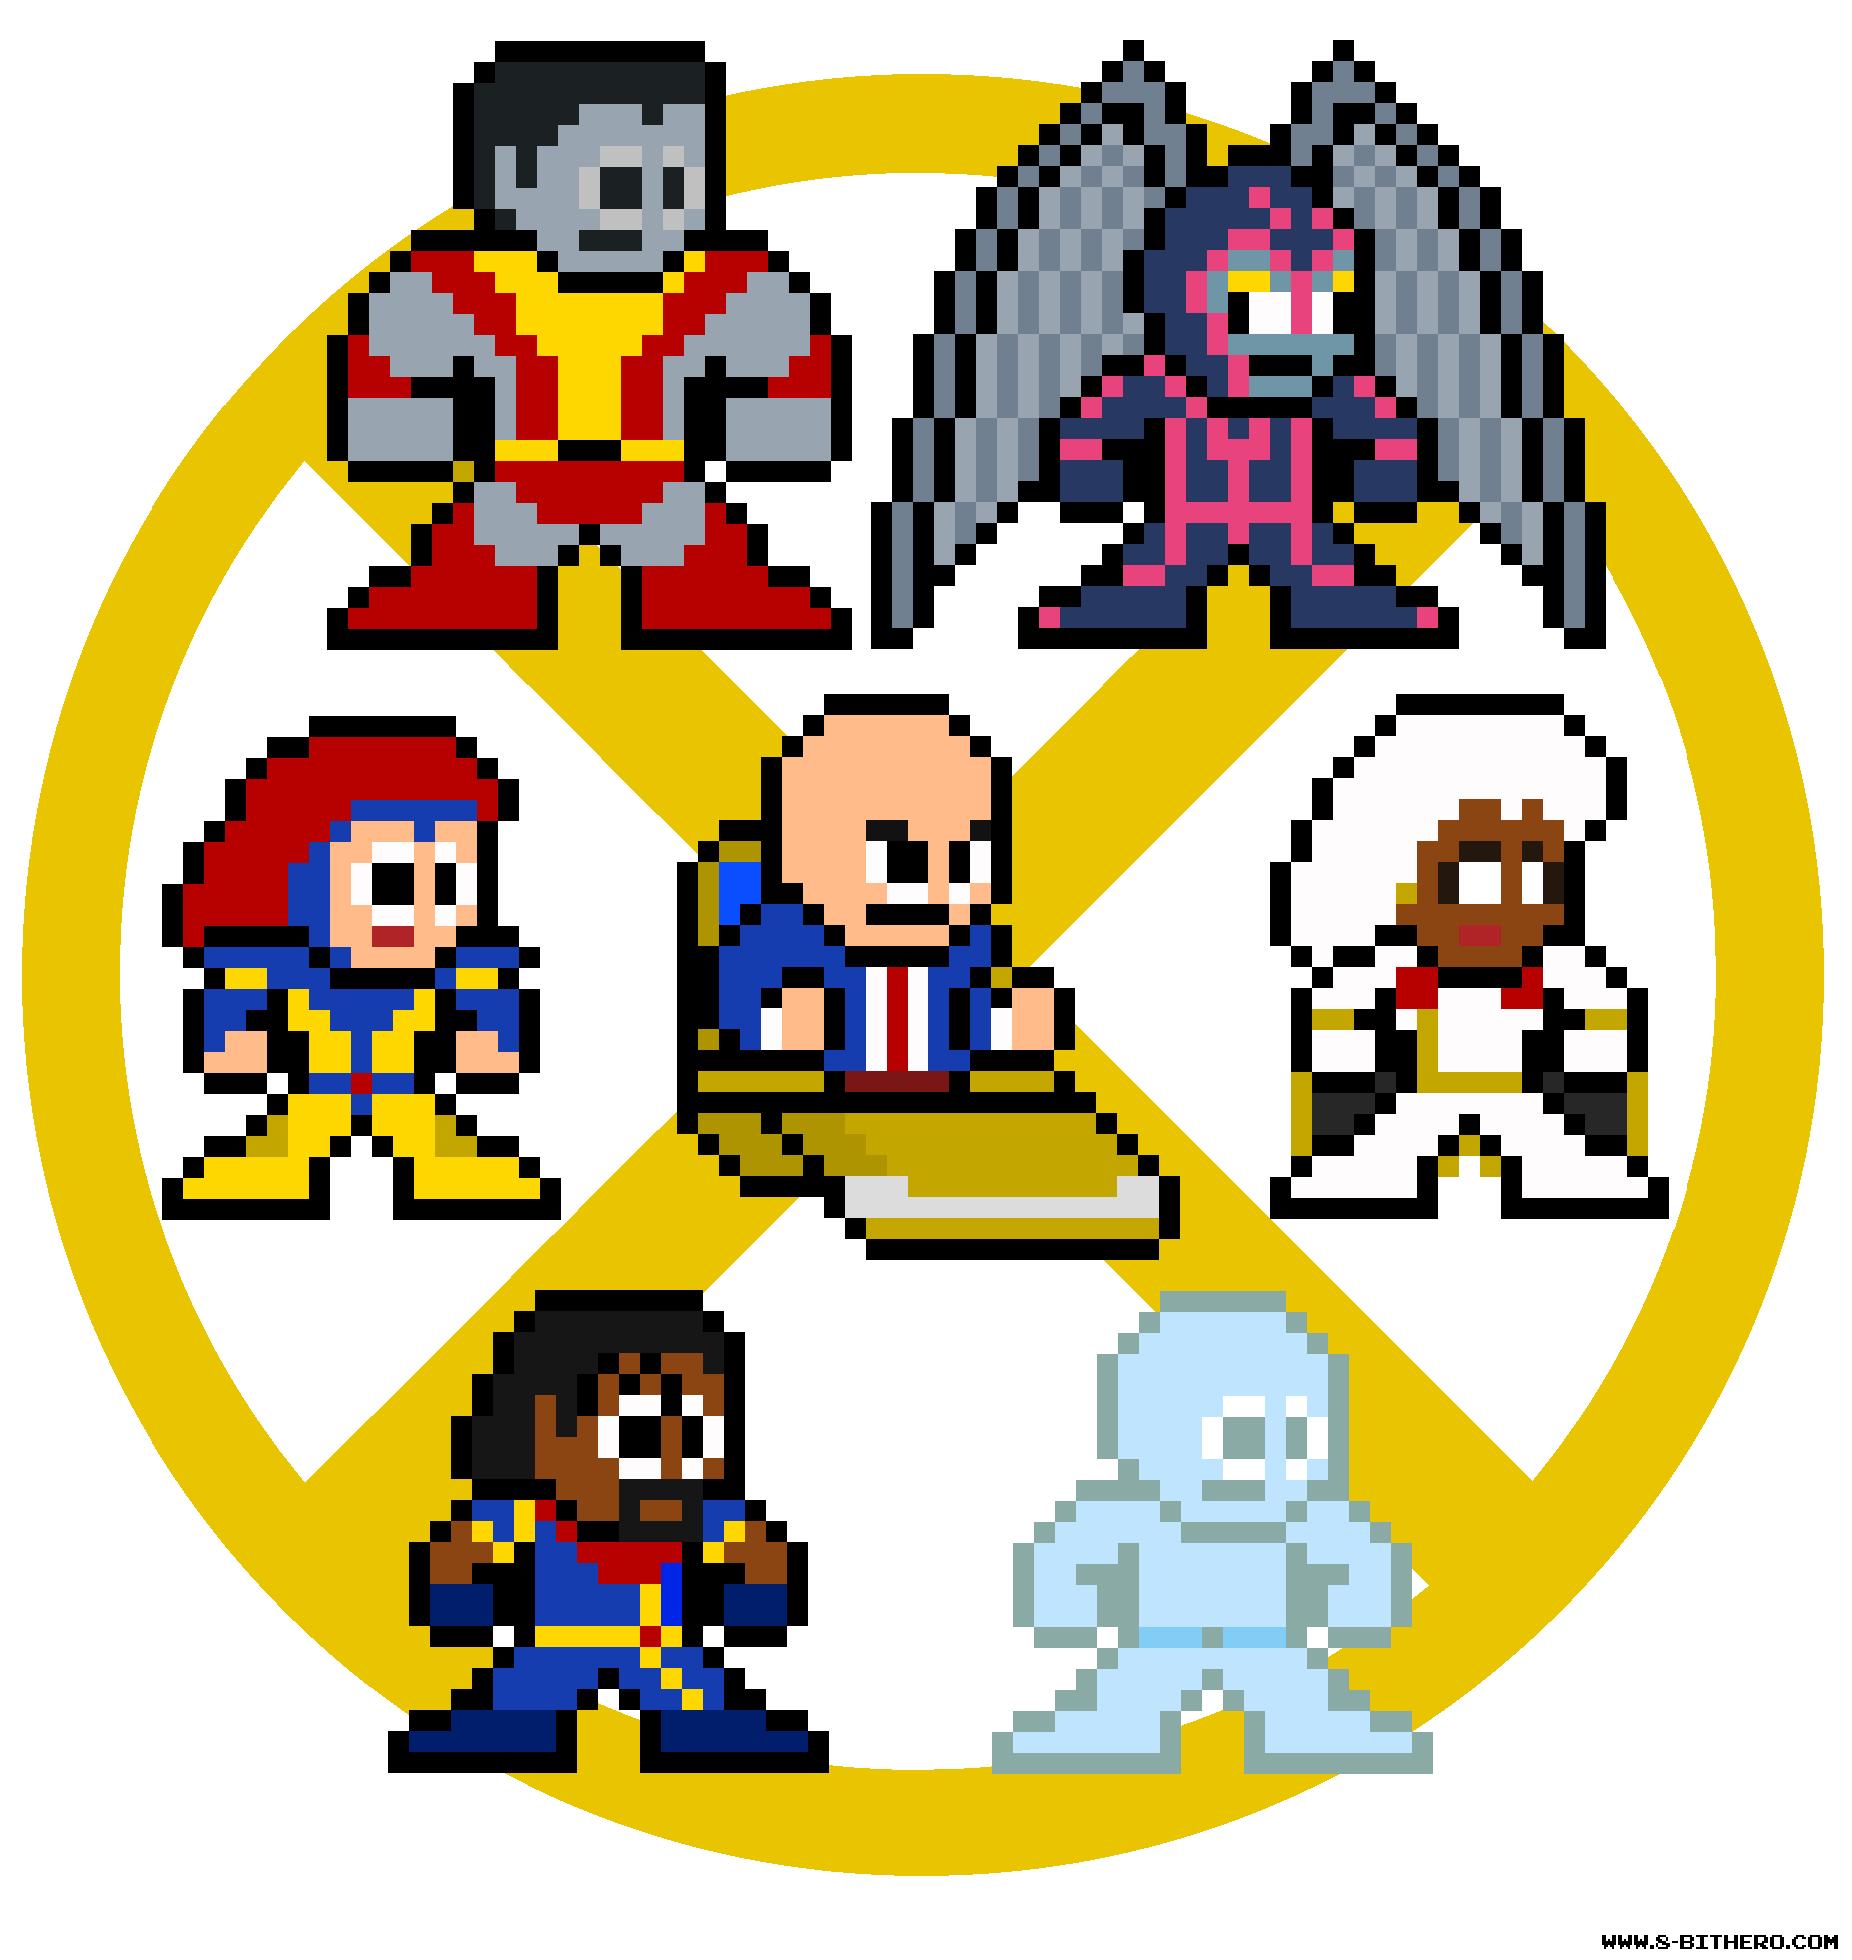 8-Bit X-Men Gold Team Marvel Pixel Sprites | Pixelated Pop Culture ...